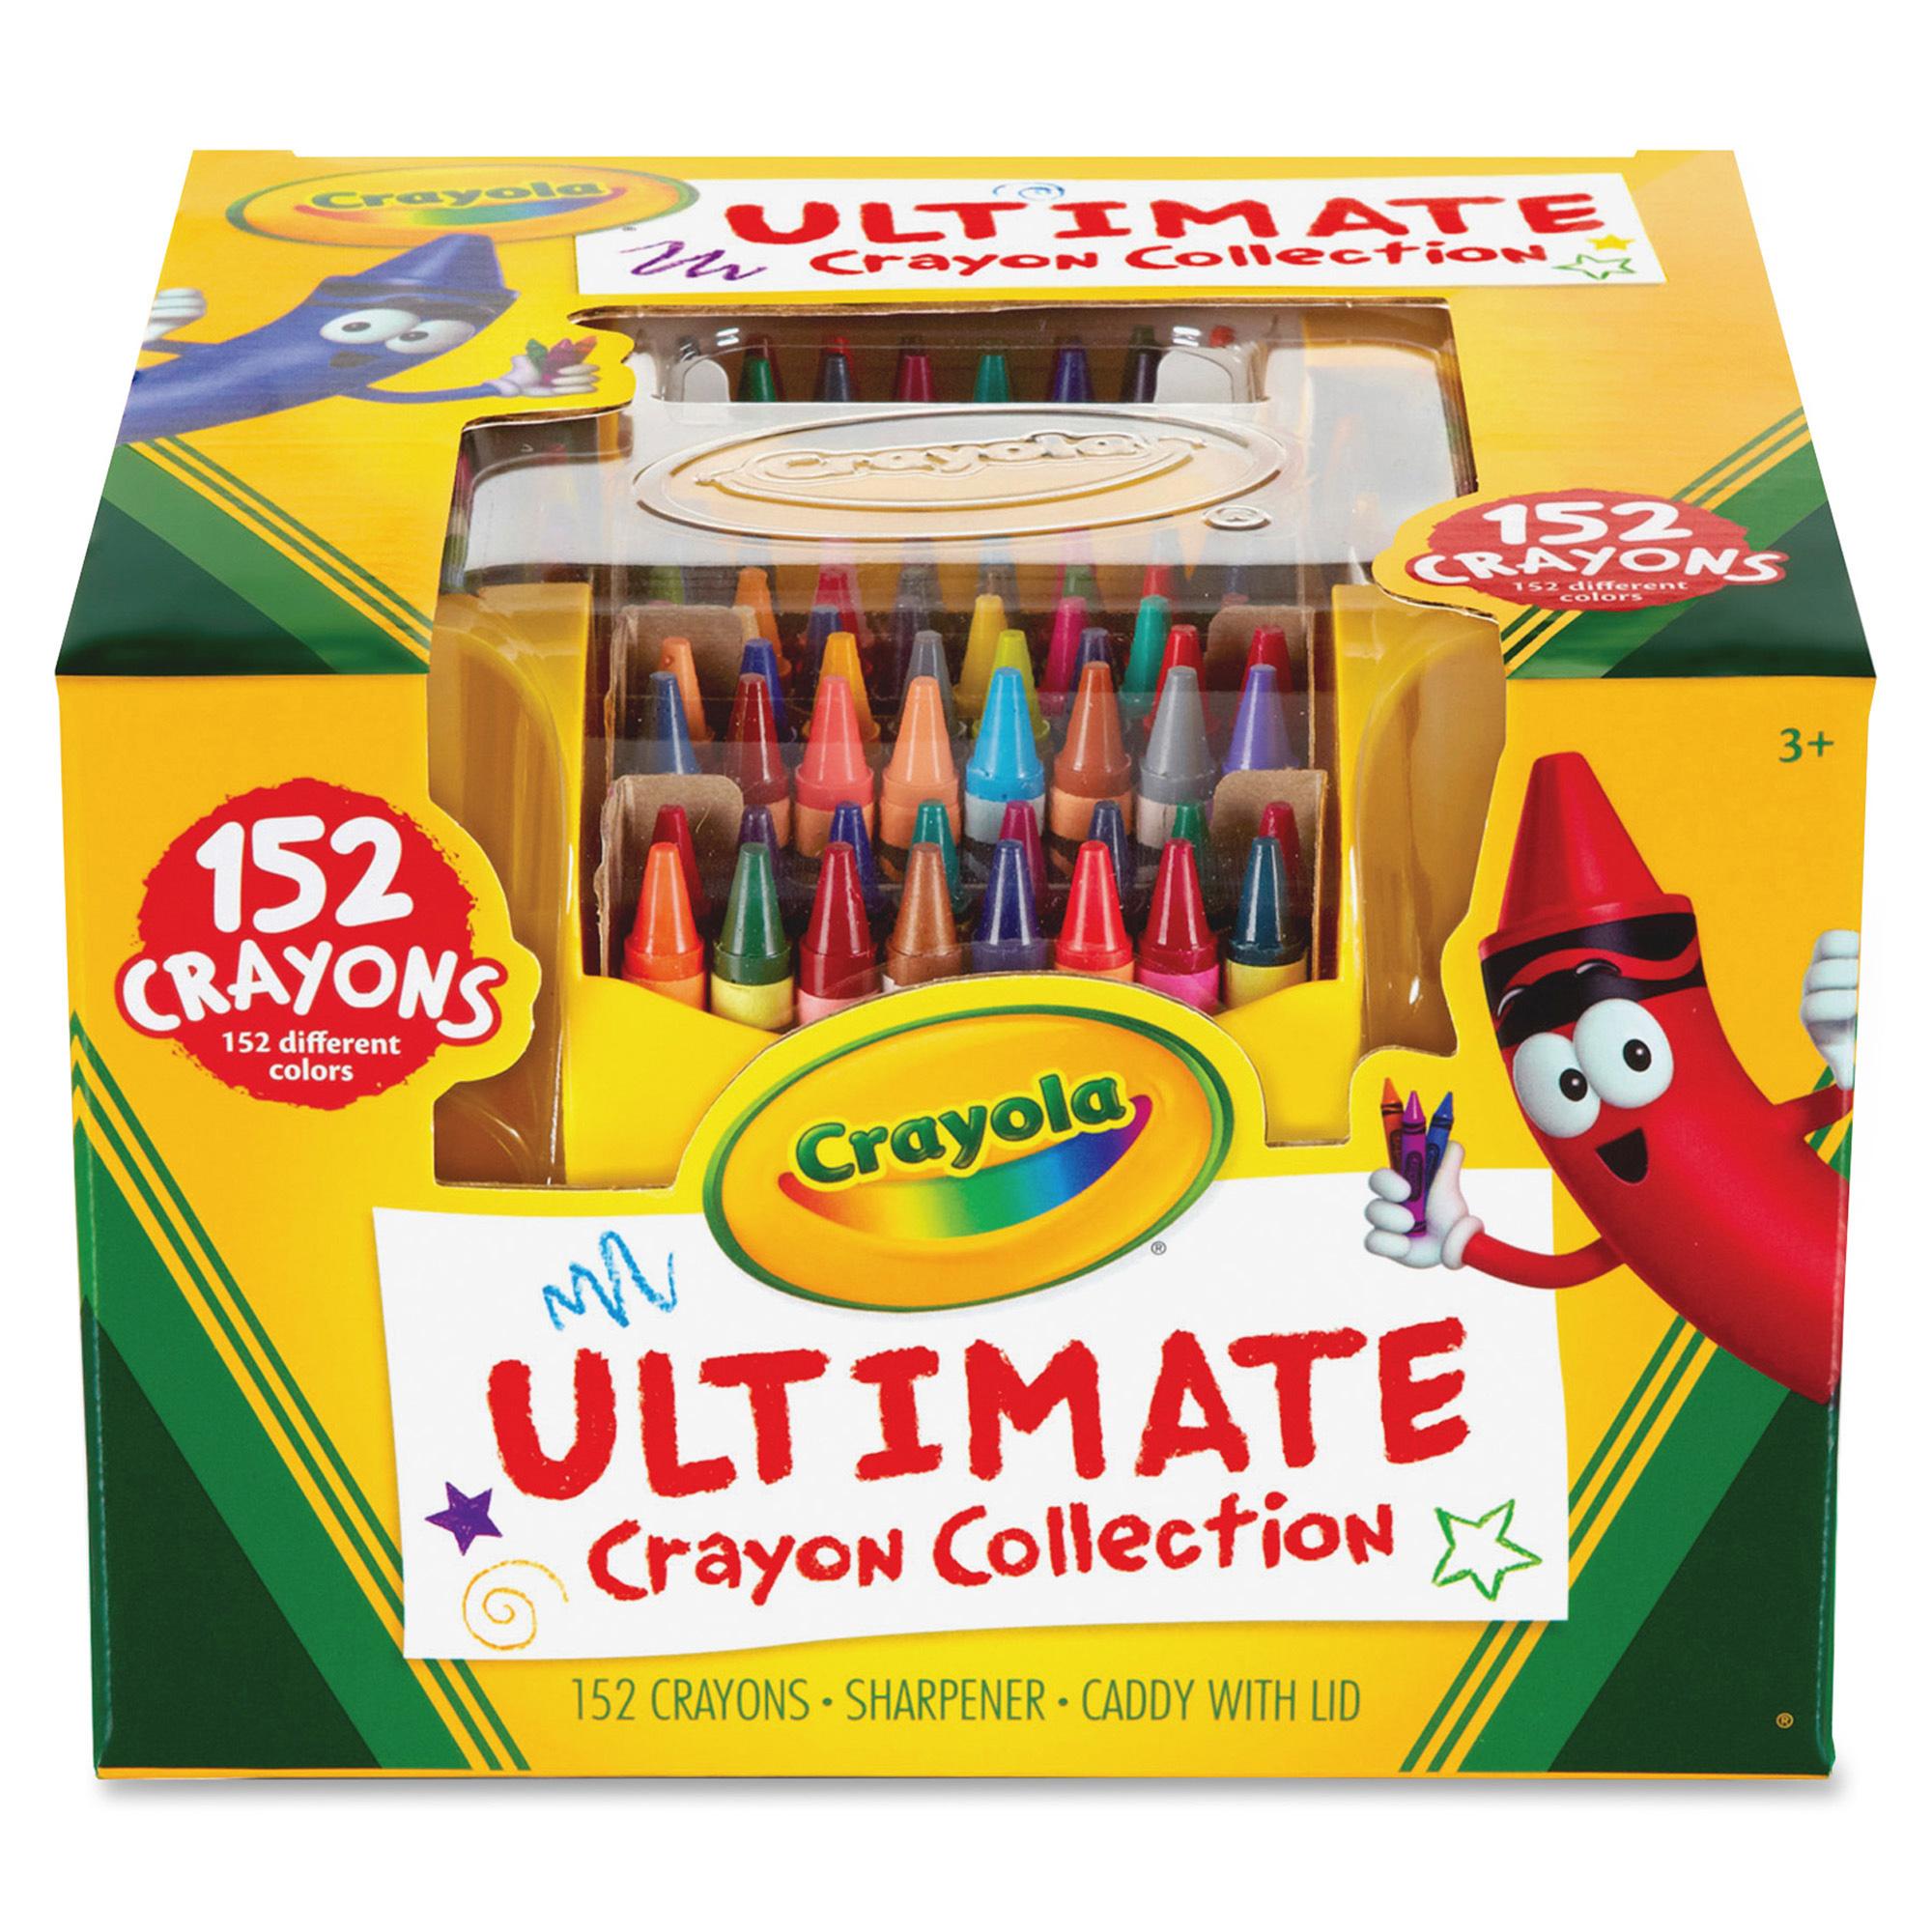 Crayola Ultimate Crayon Collection - CYO520030